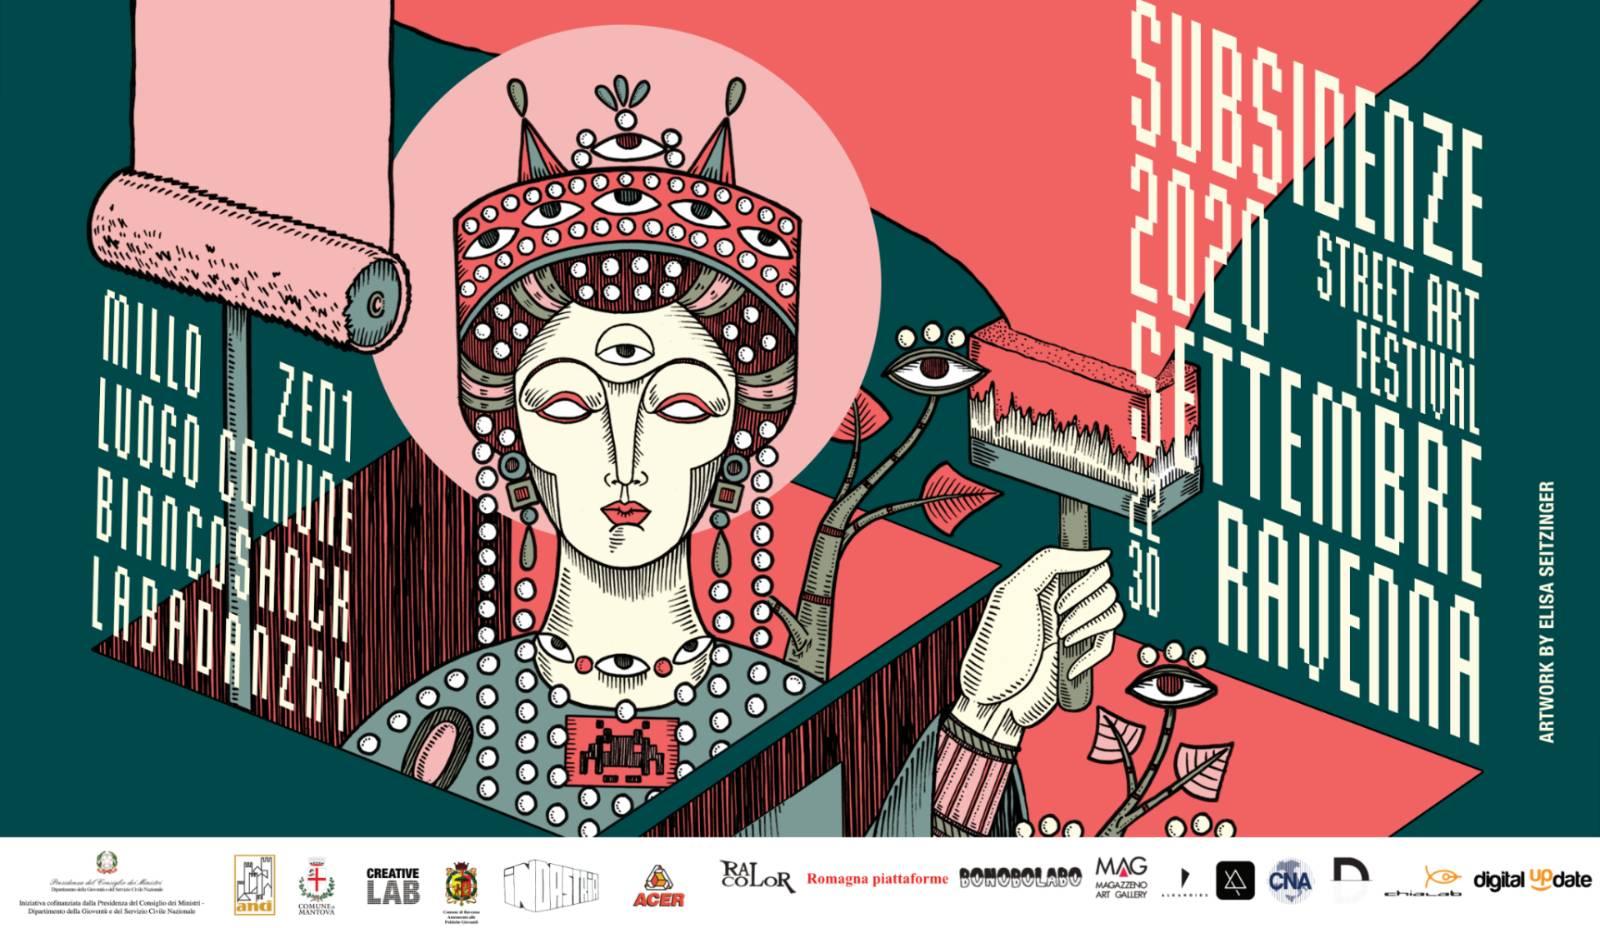 Subsidenze Associazione Culturale Indastria – Street Art Festival 2020